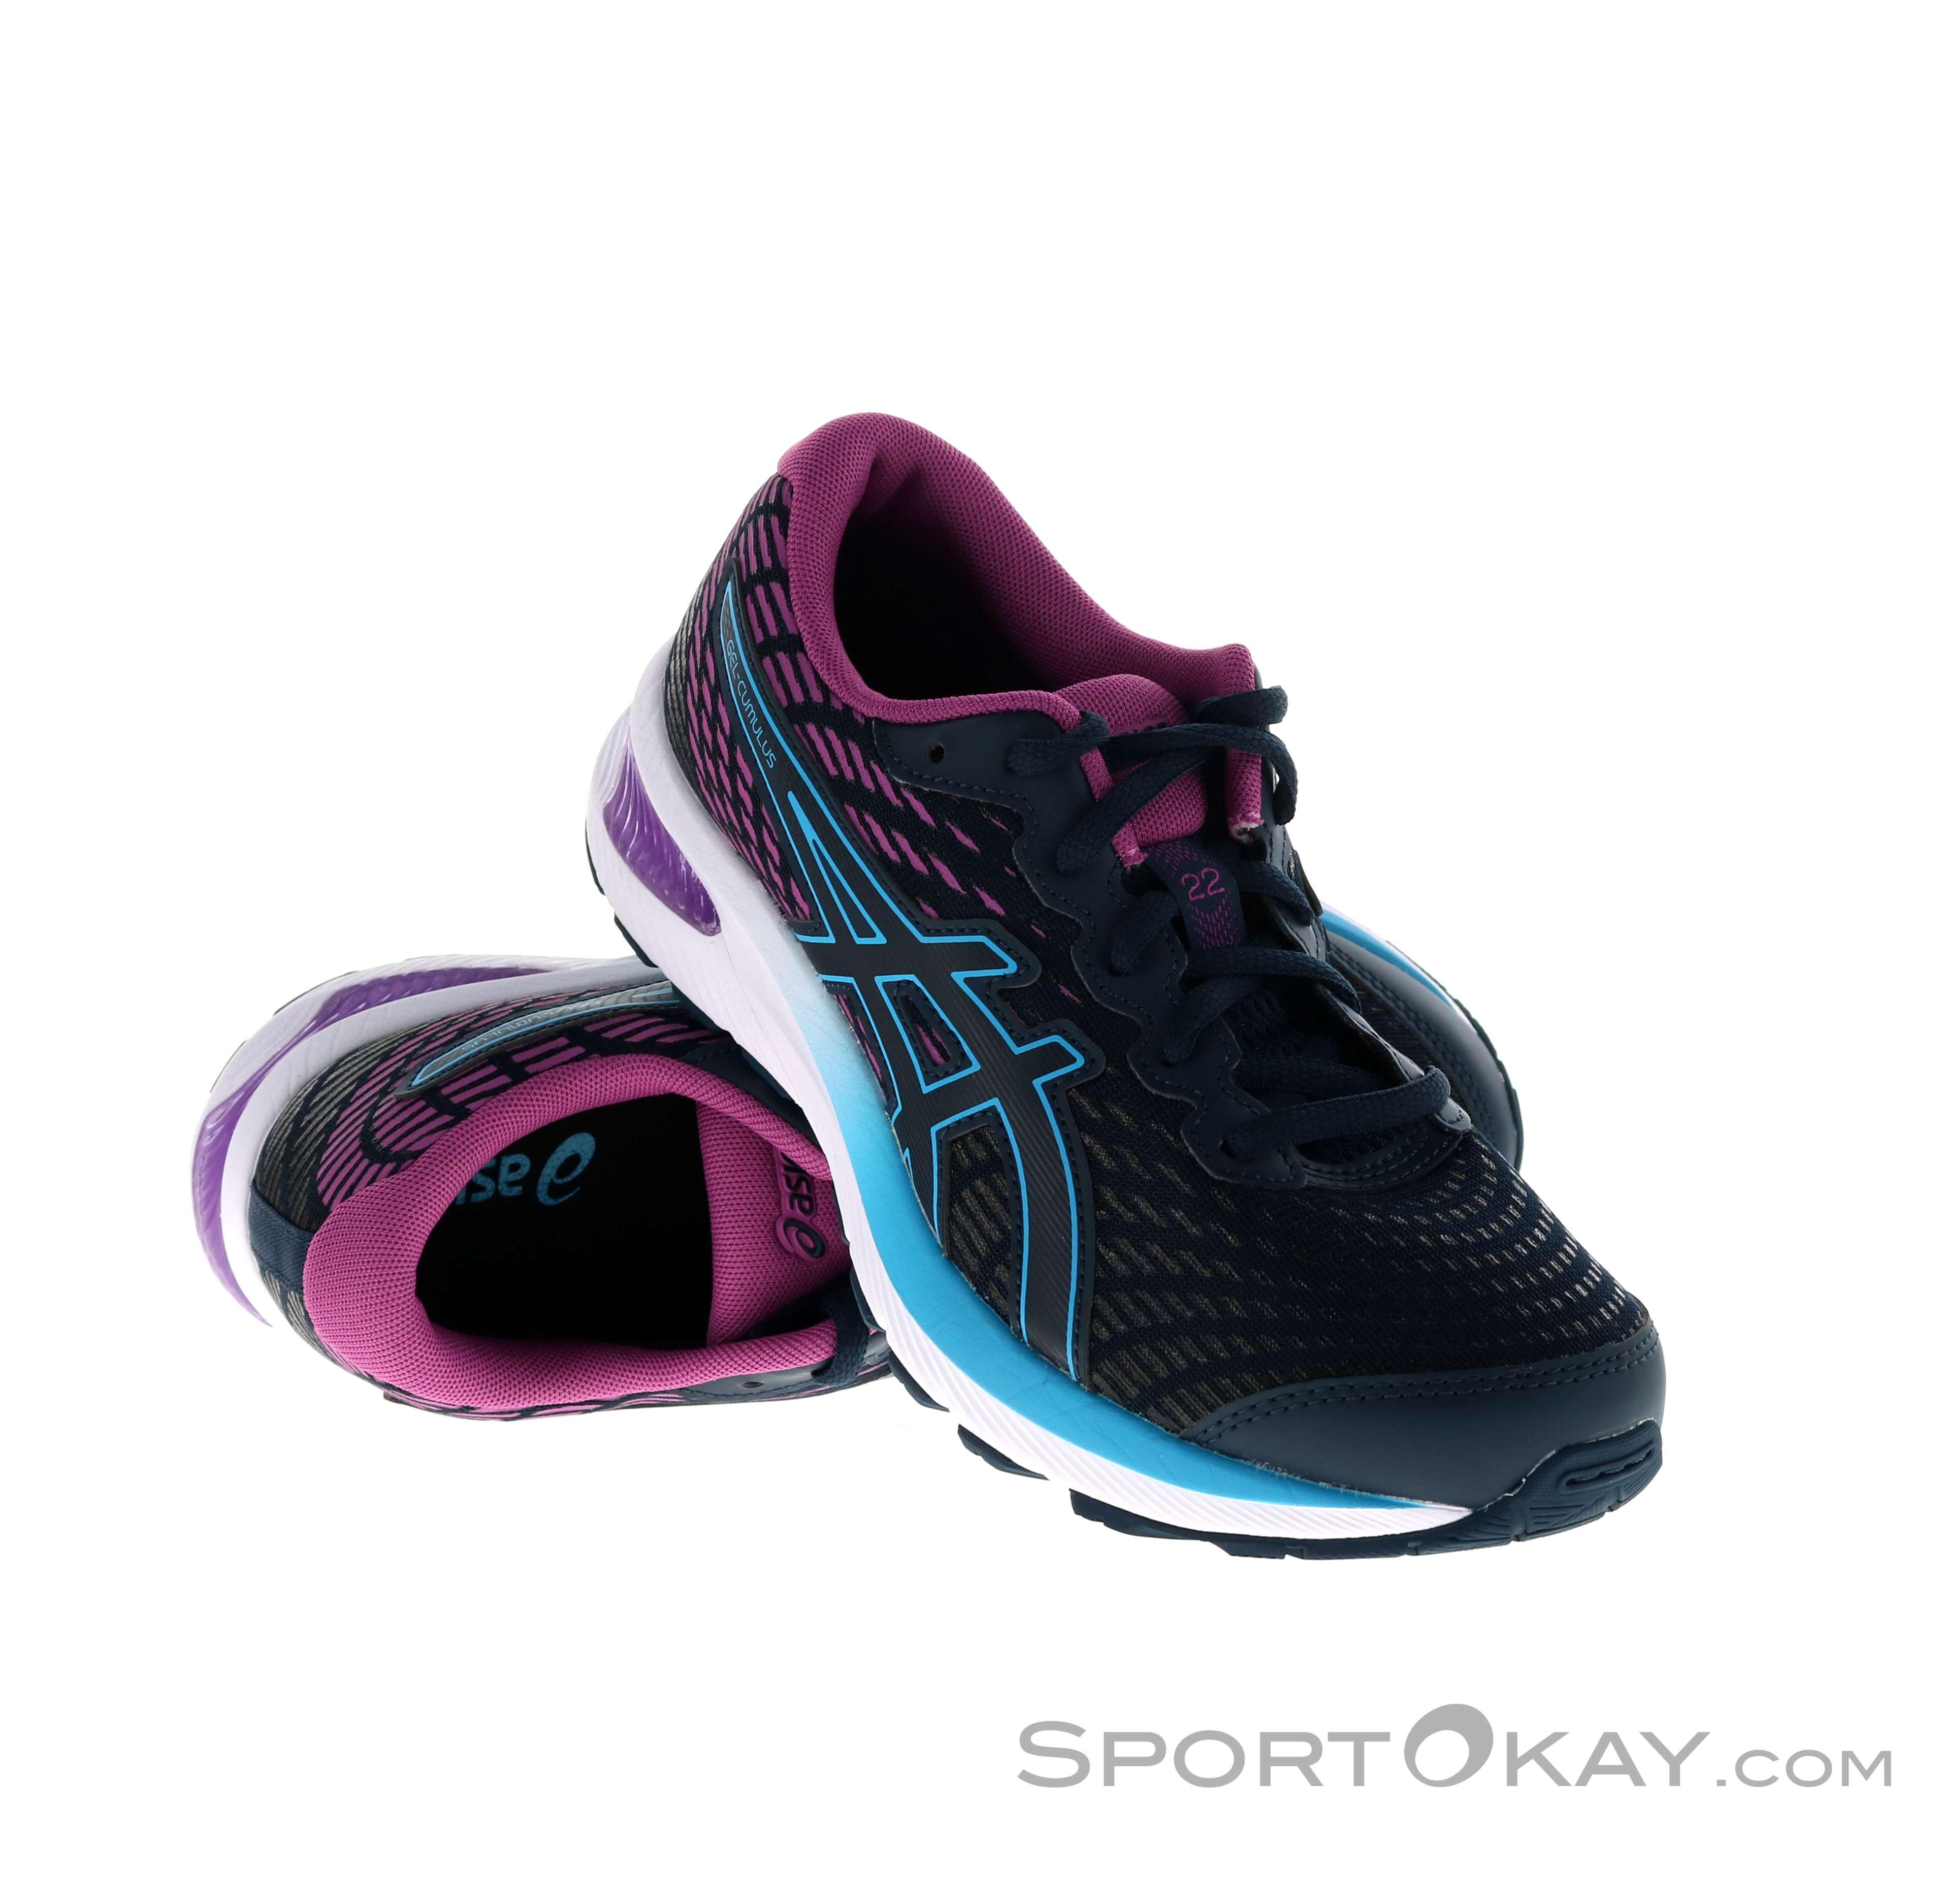 Asics Asics Gel-Cumulus 22 GS Kids Running Shoes